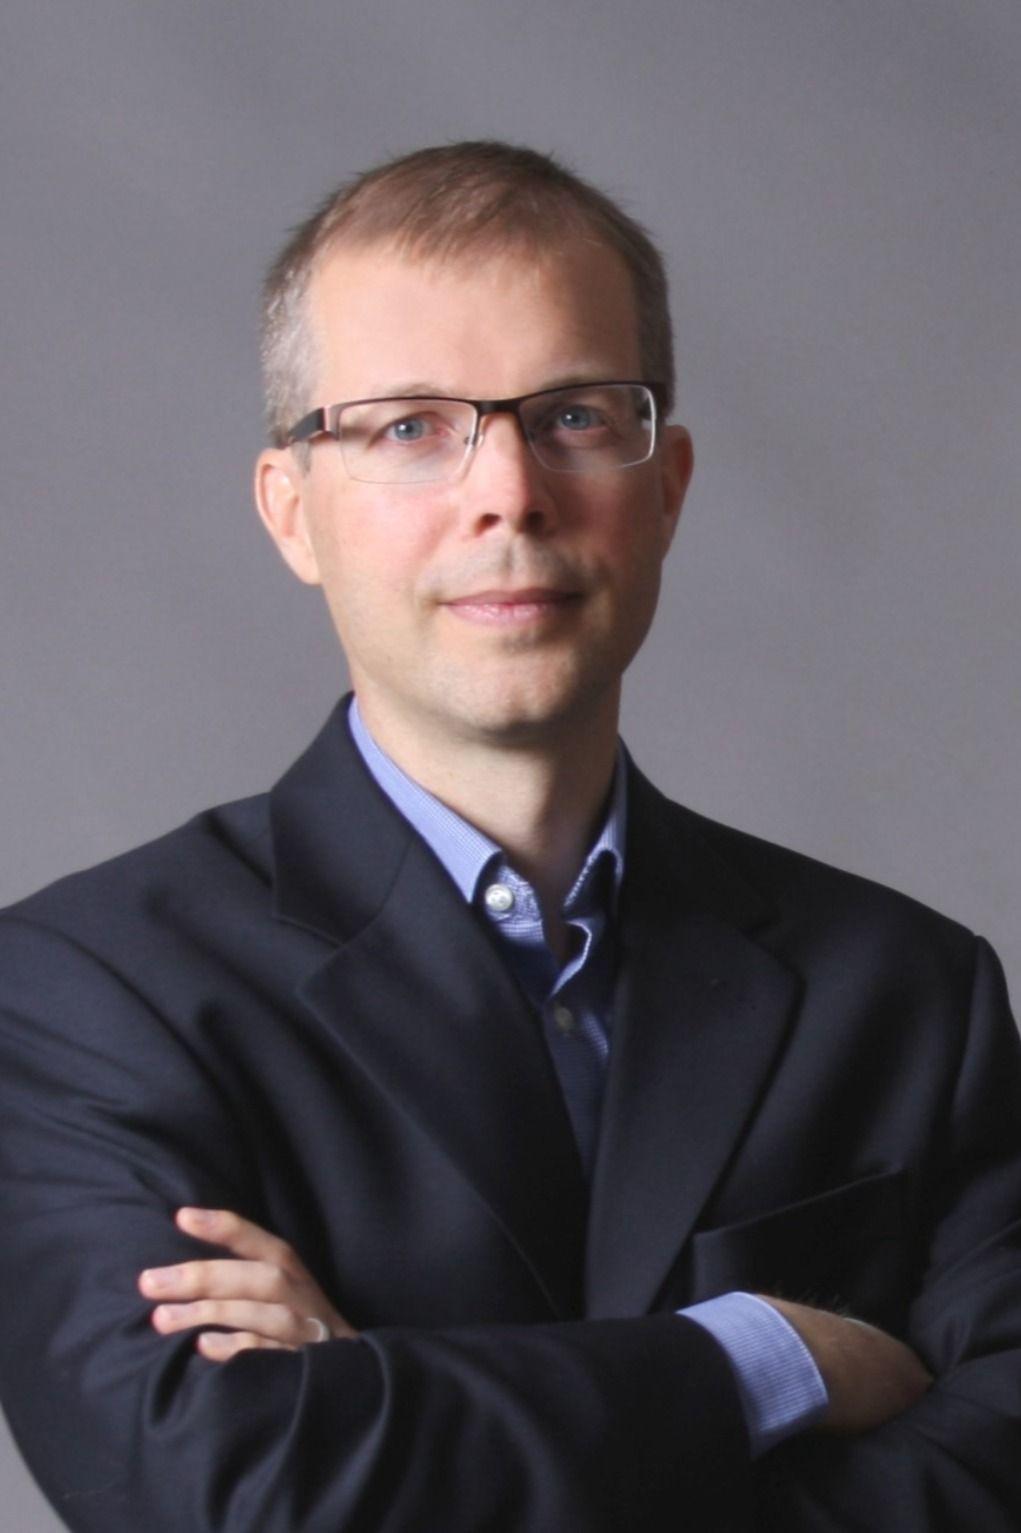 Dr. Shaun Lehmann in 2020 Sports medicine, Medicine, Sports